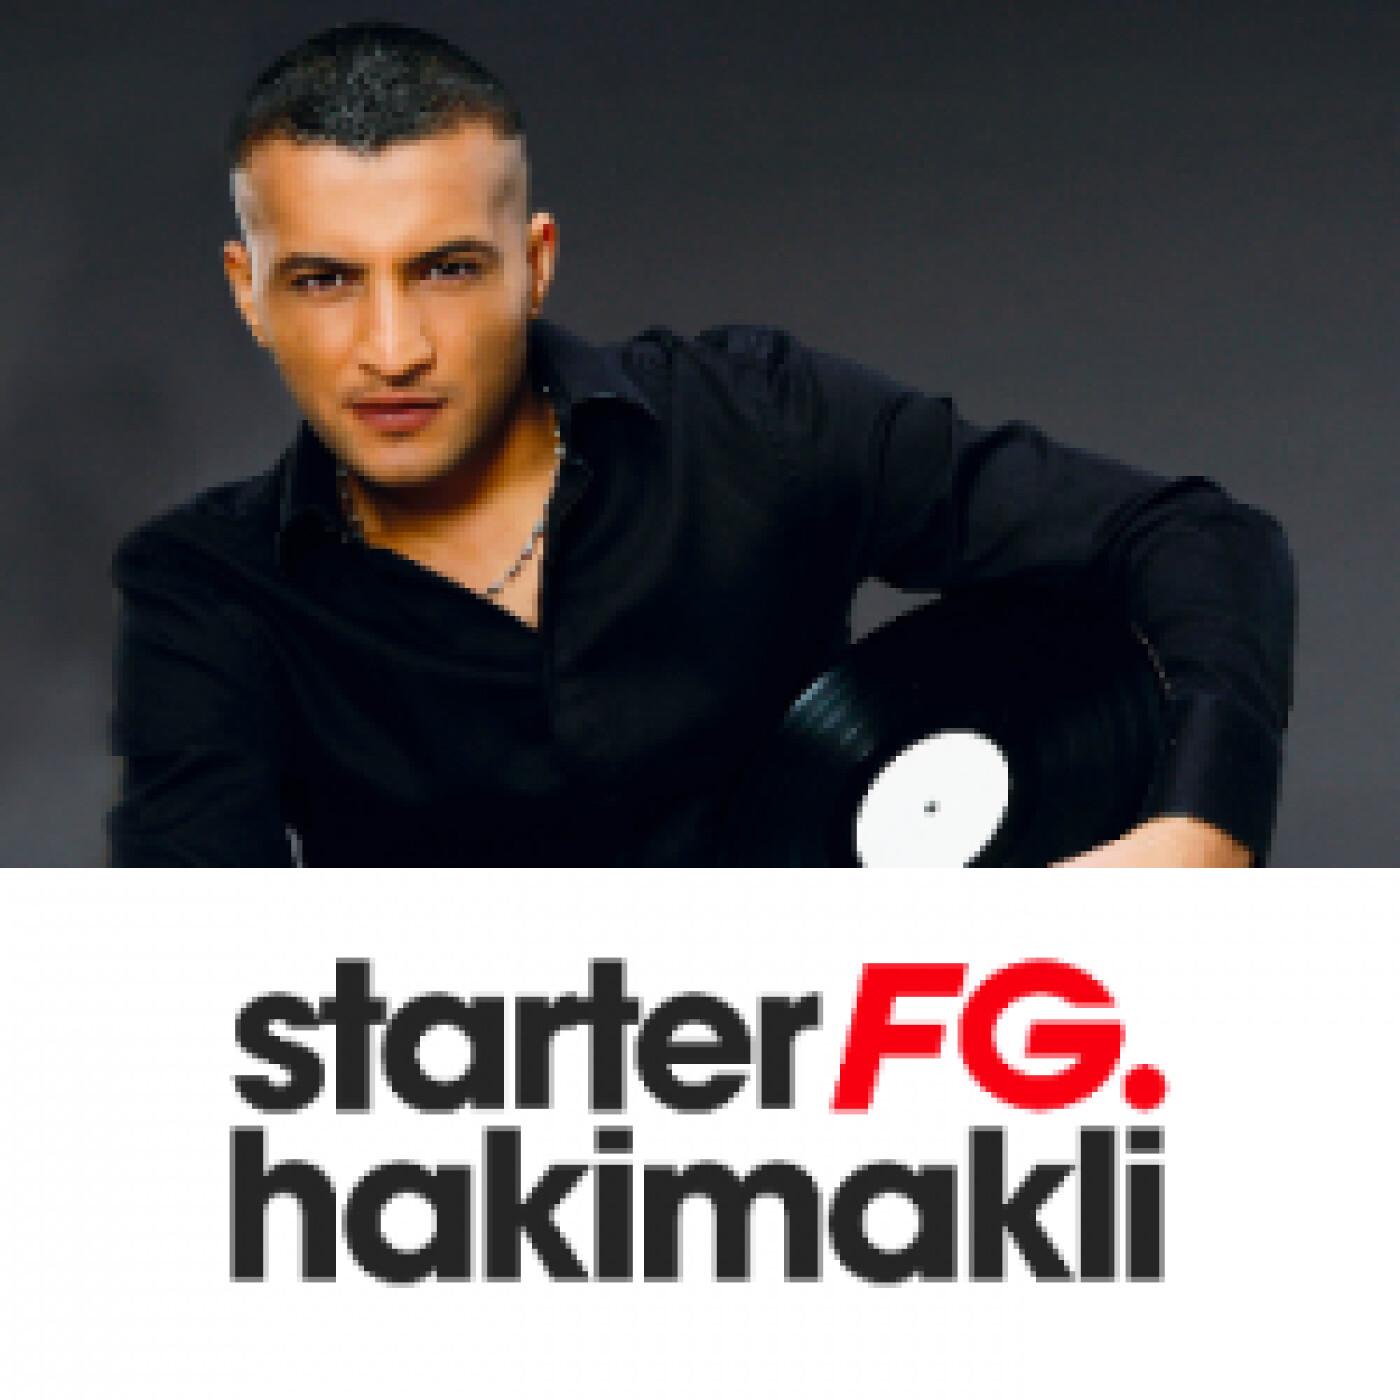 STARTER FG BY HAKIMAKLI JEUDI 20 MAI 2021